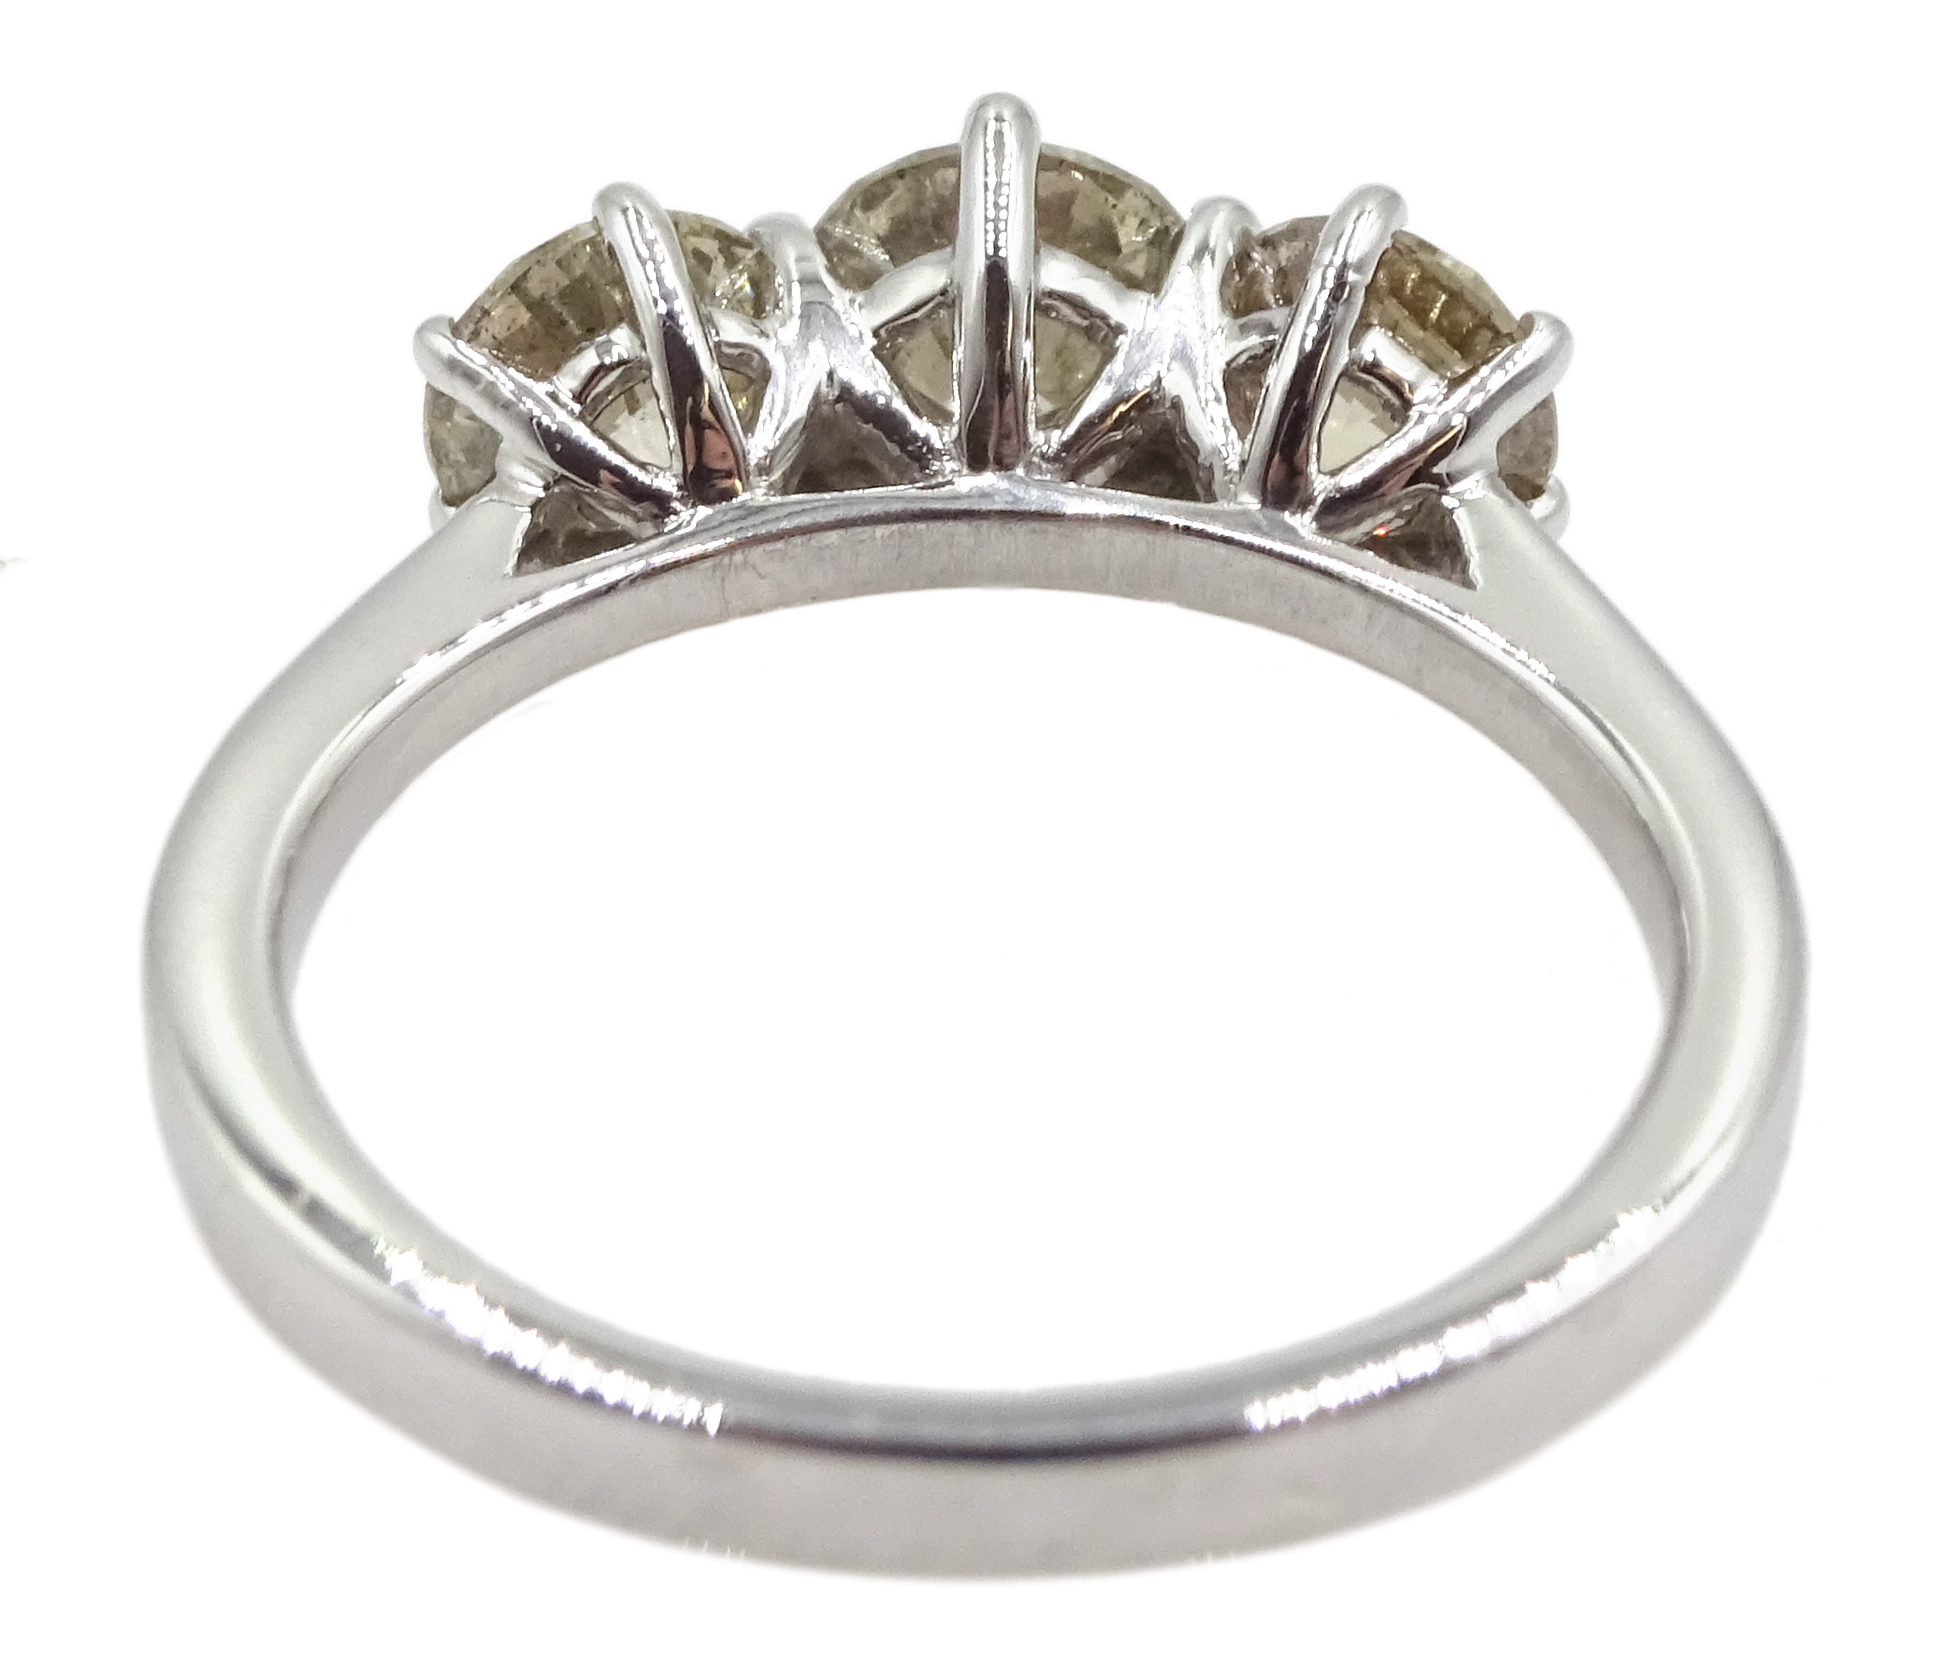 18ct white gold three stone round brilliant cut diamond ring, total diamond weight 2.16 carat, - Image 5 of 7